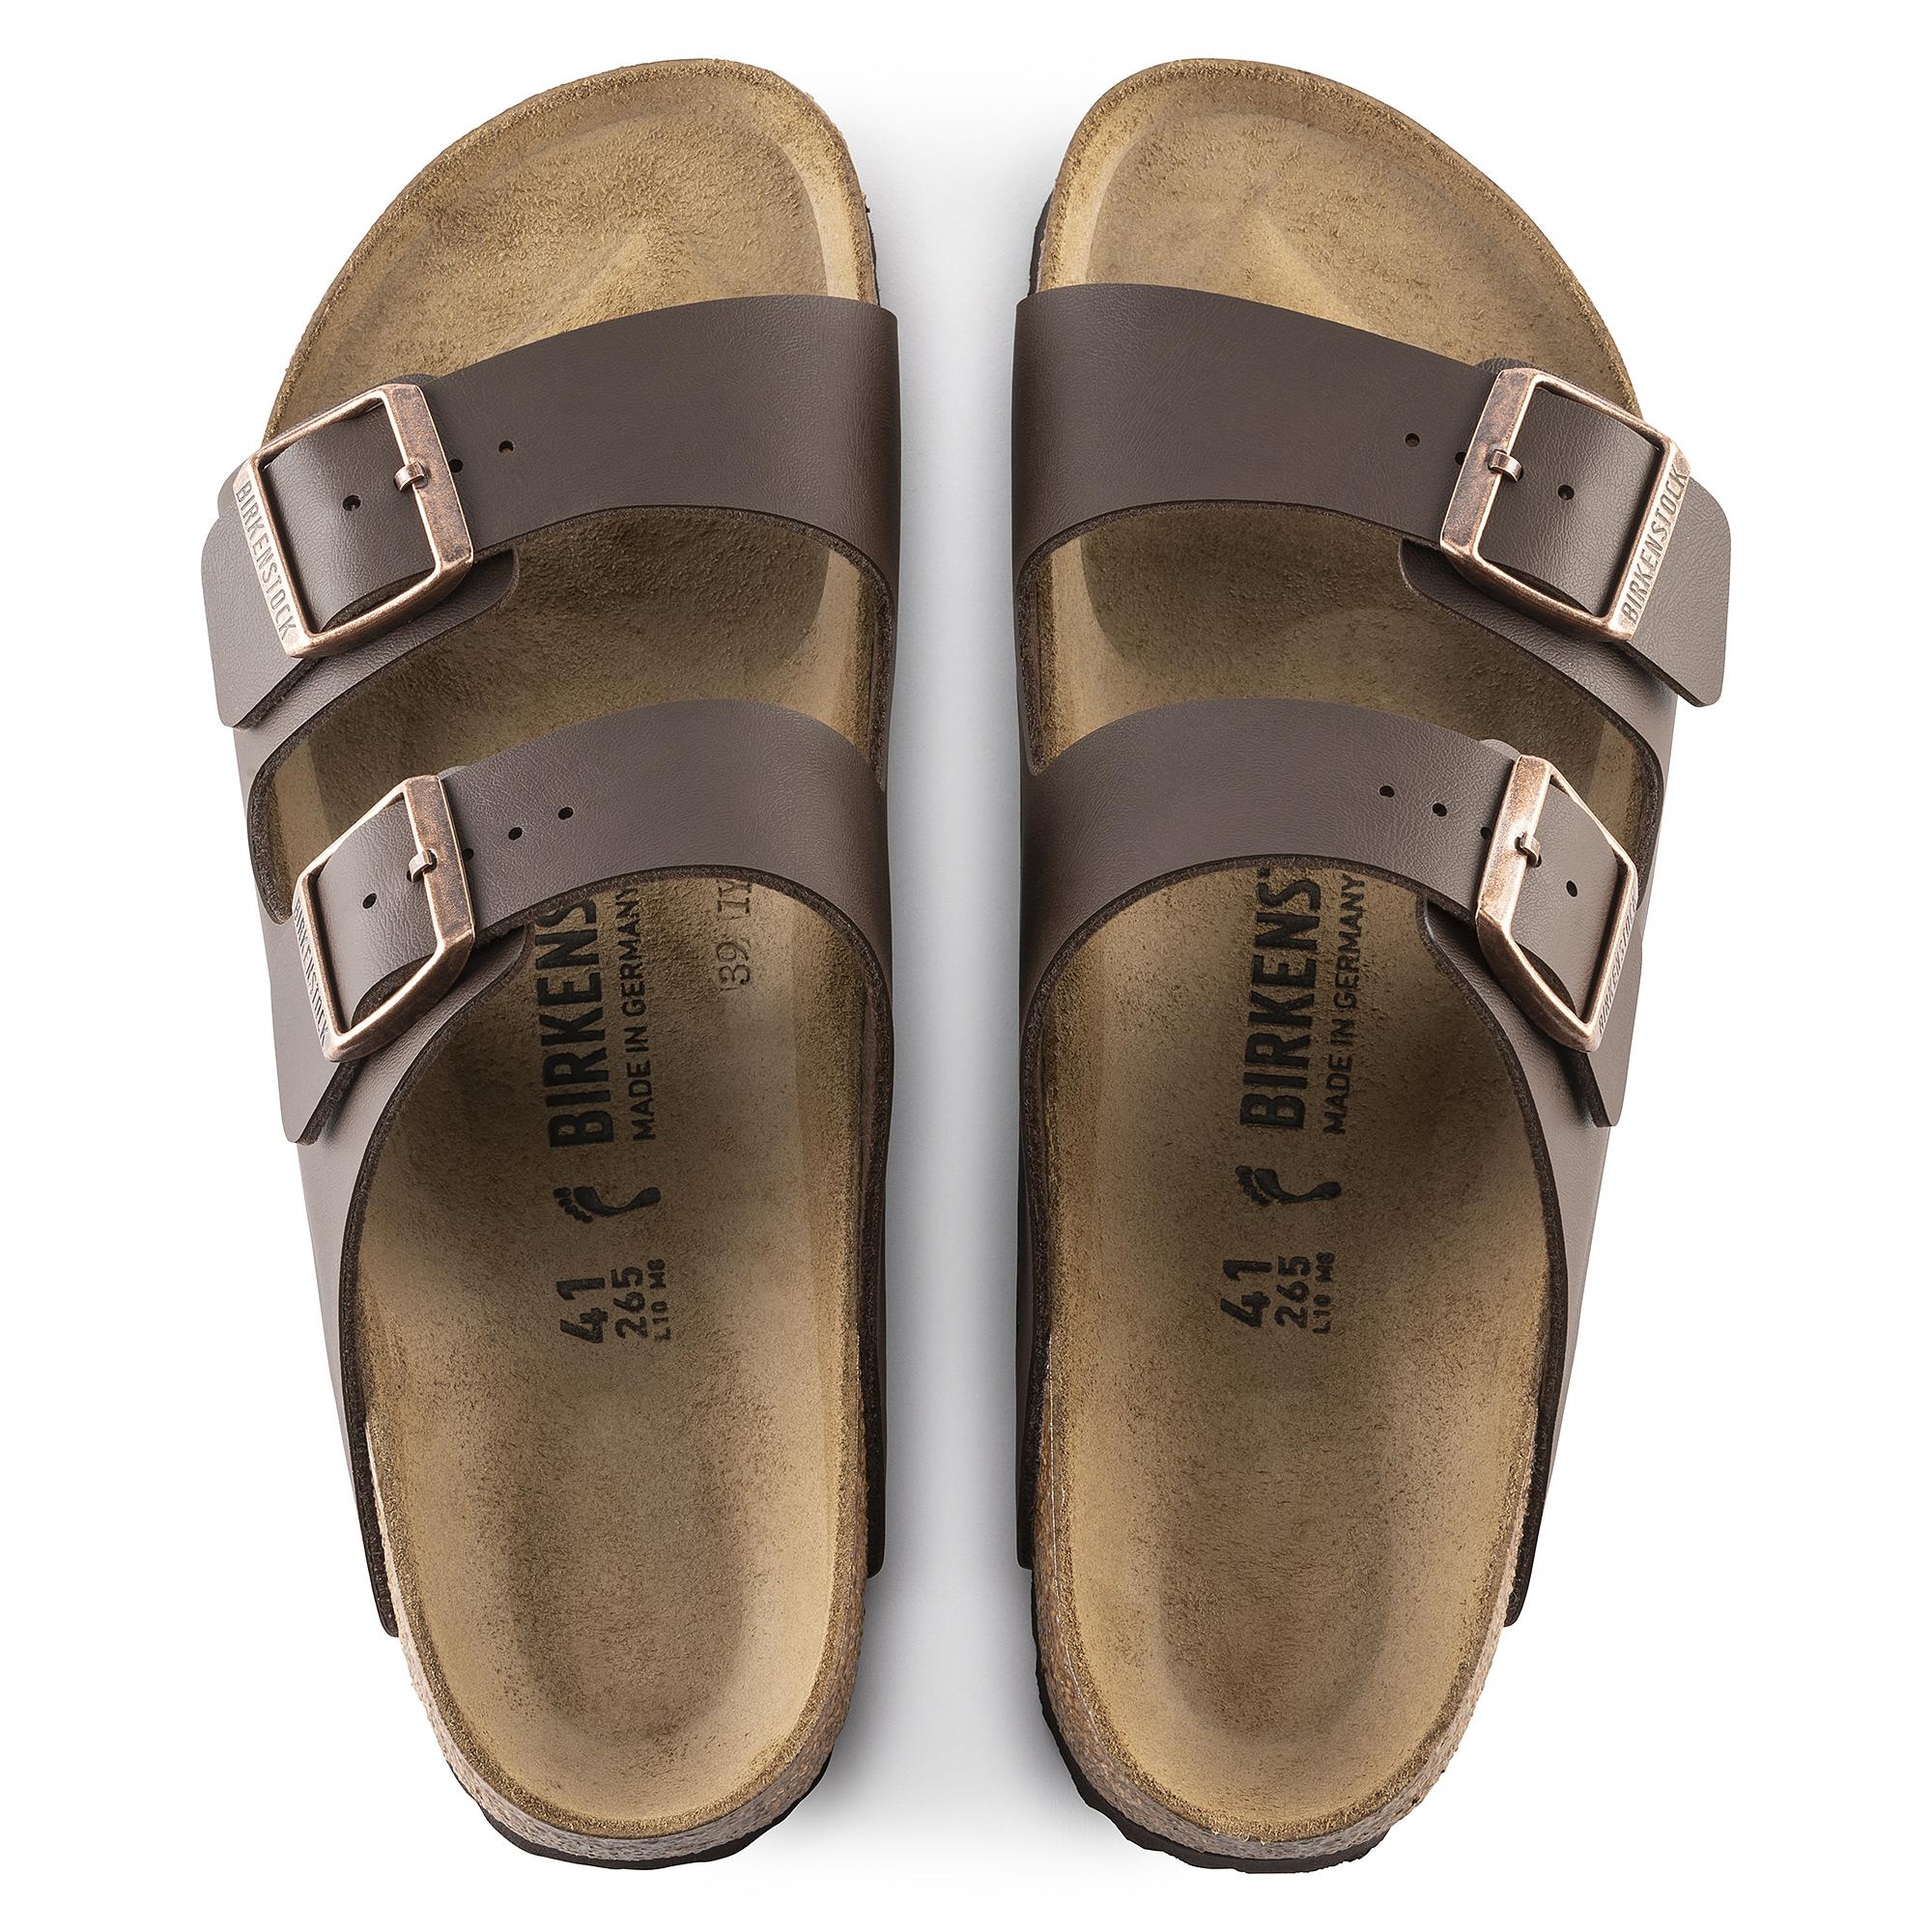 Birkenstock Arizona Birko Flor Soft Leather Sandals dark